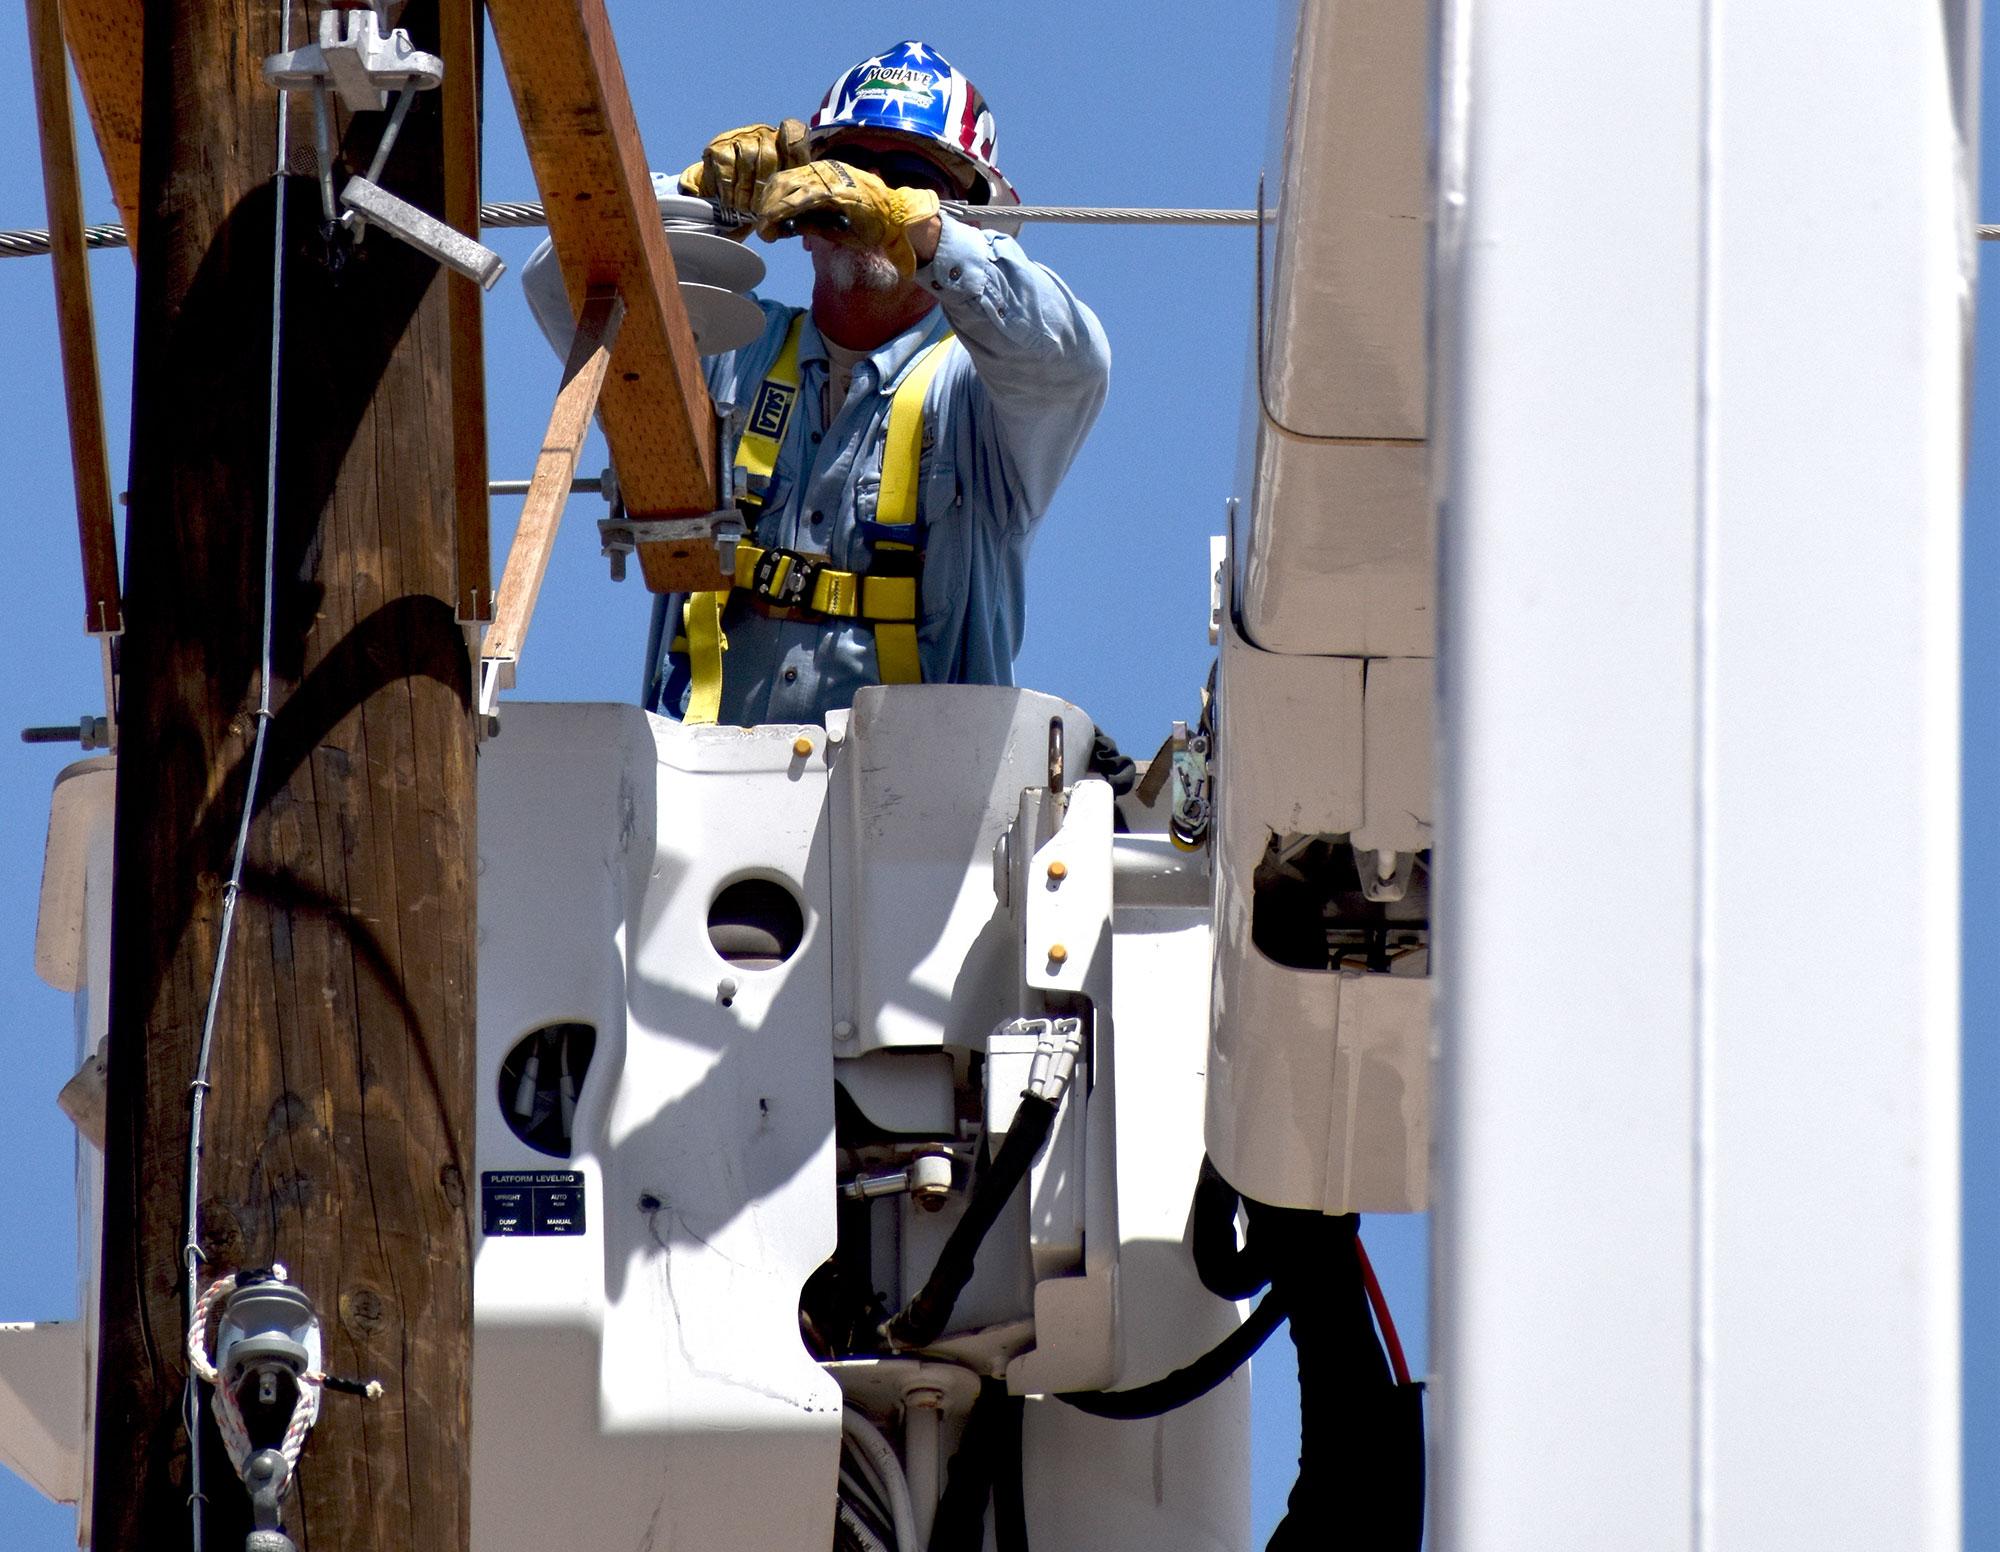 Lineman working on power pole